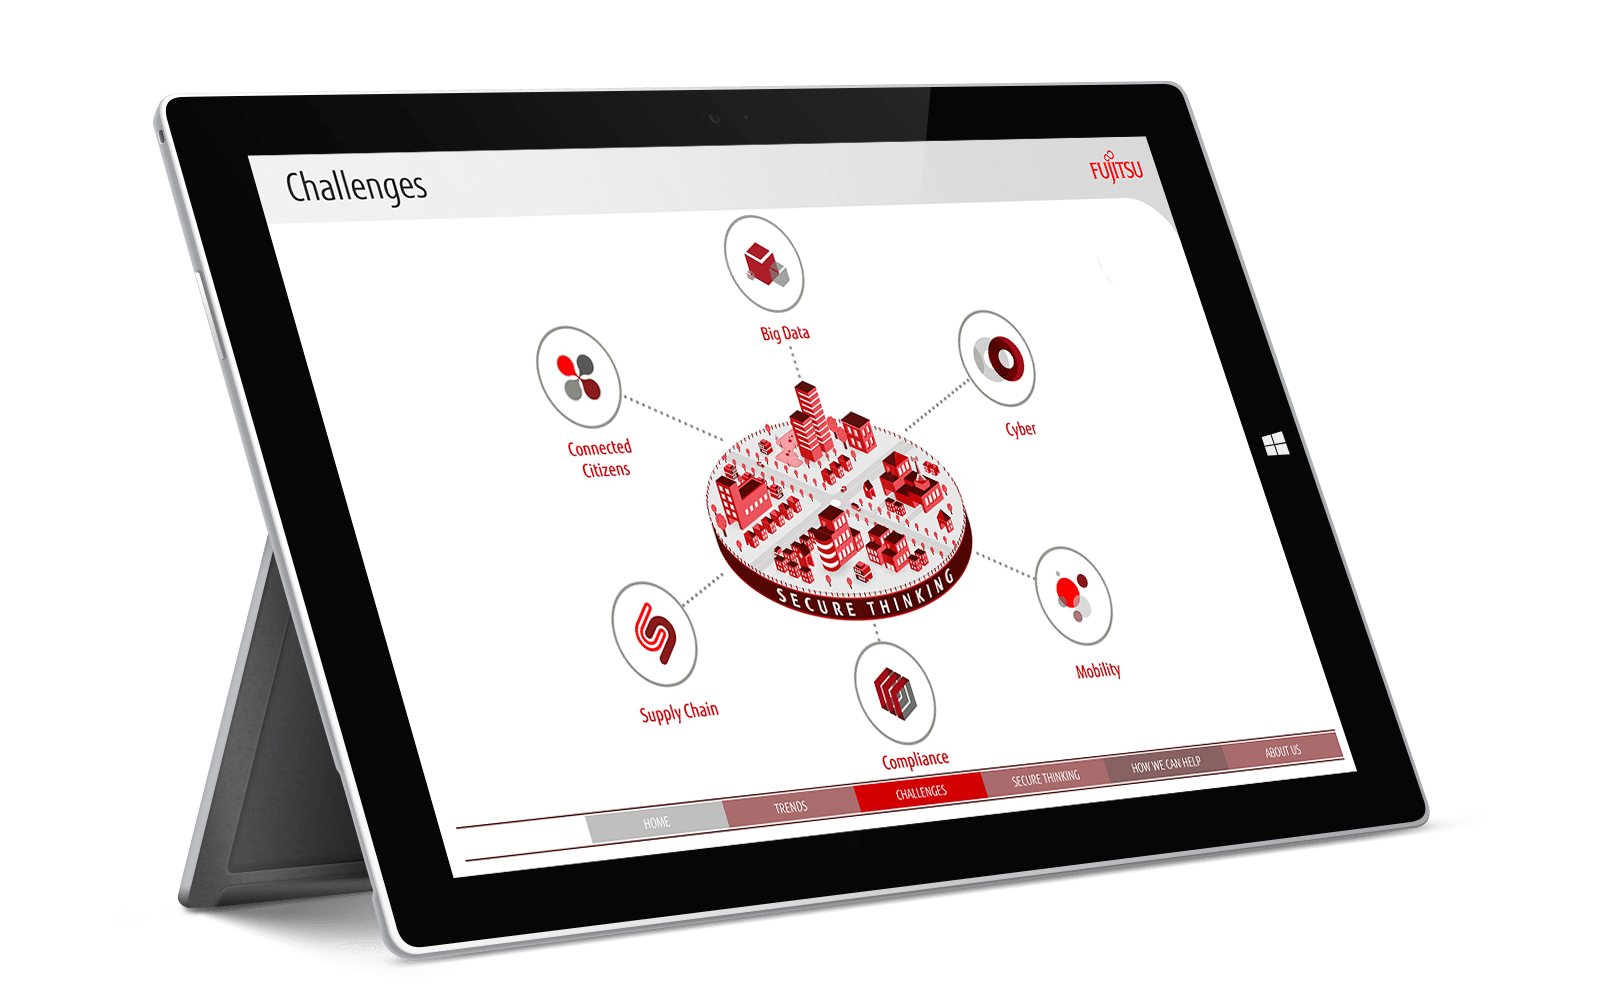 Fujitsu interactive touchscreen sales enablement tool displayed on black iPad